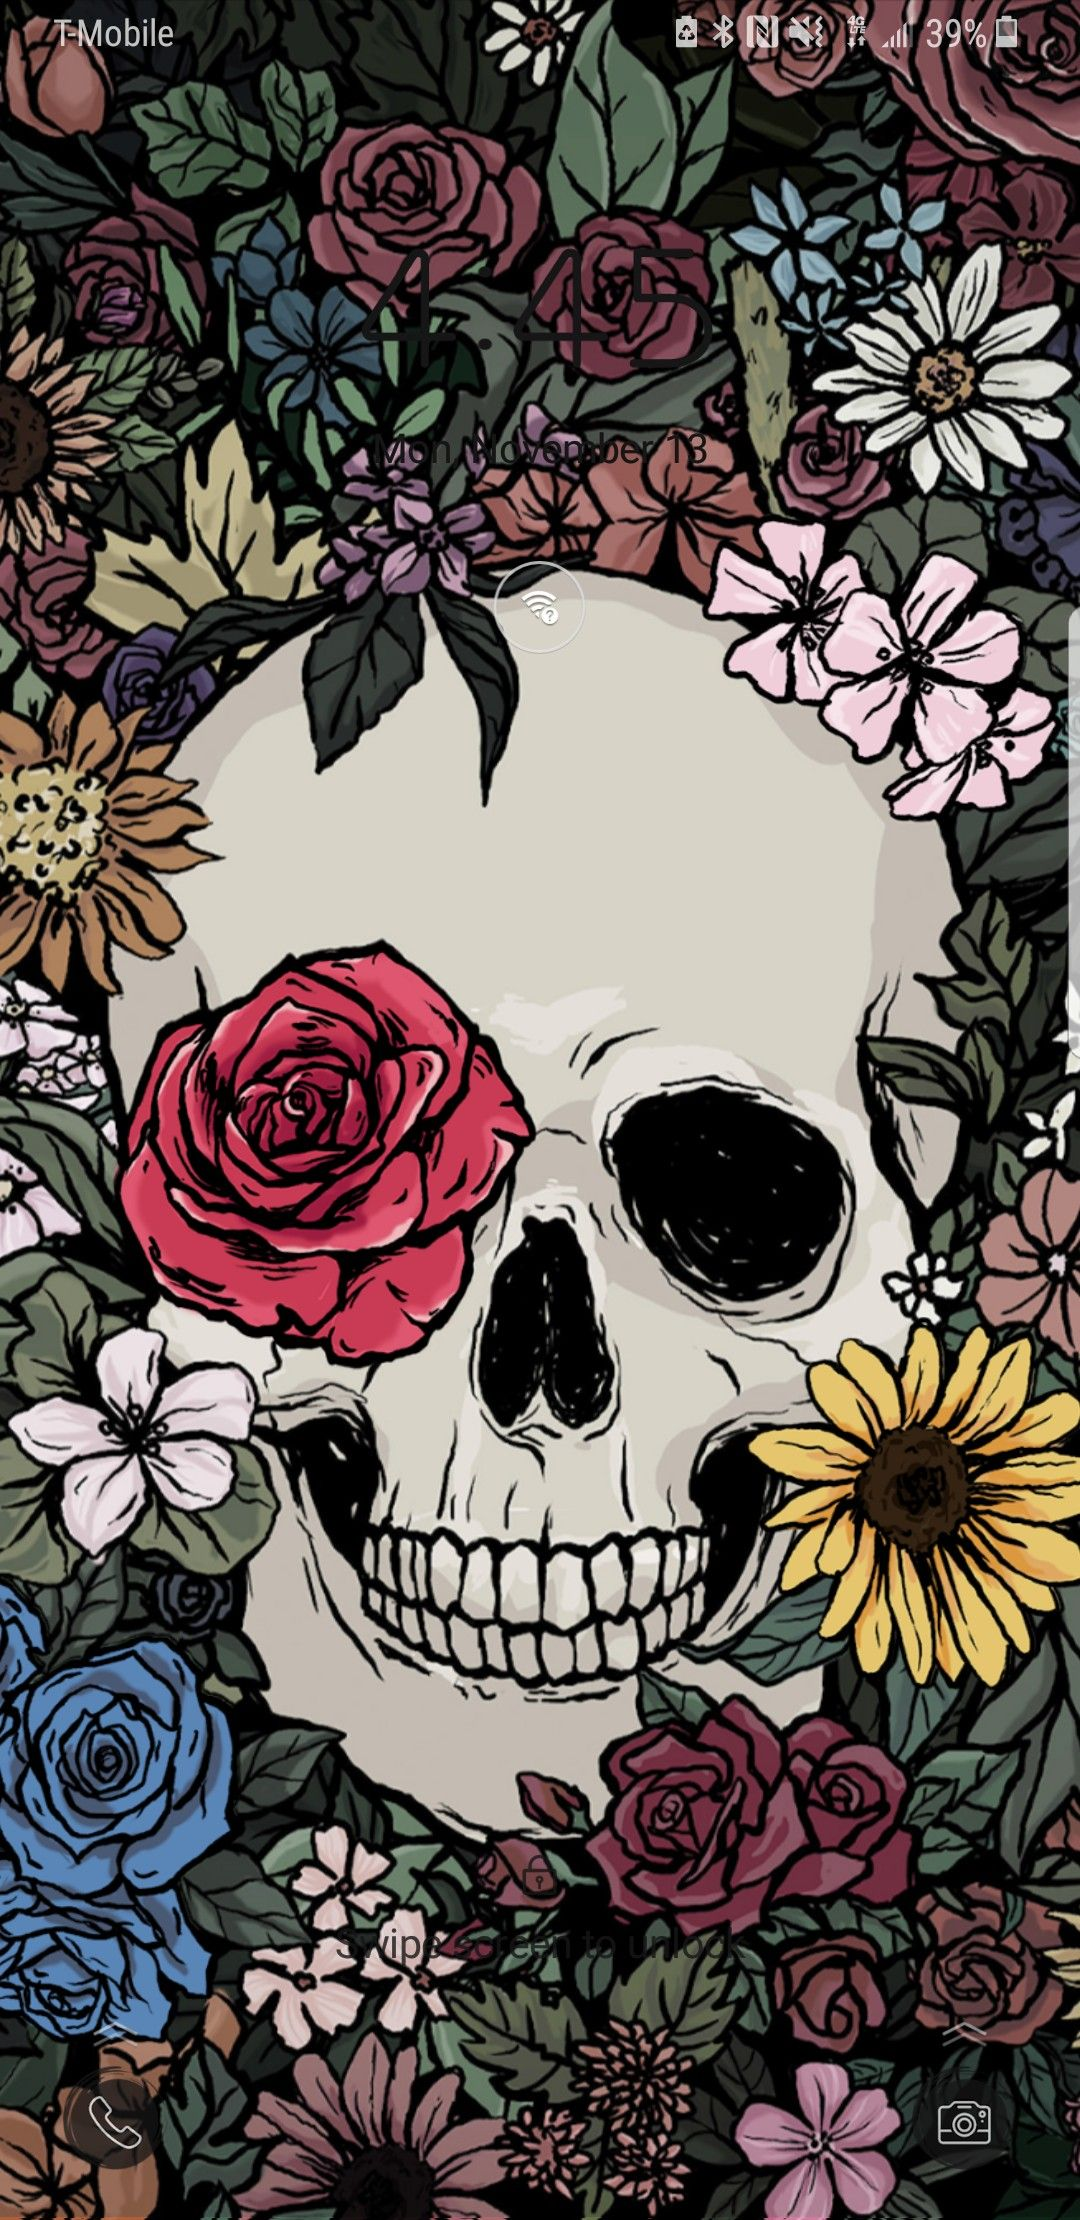 Calavera Skull Wallpaper Skeleton Art Drawings